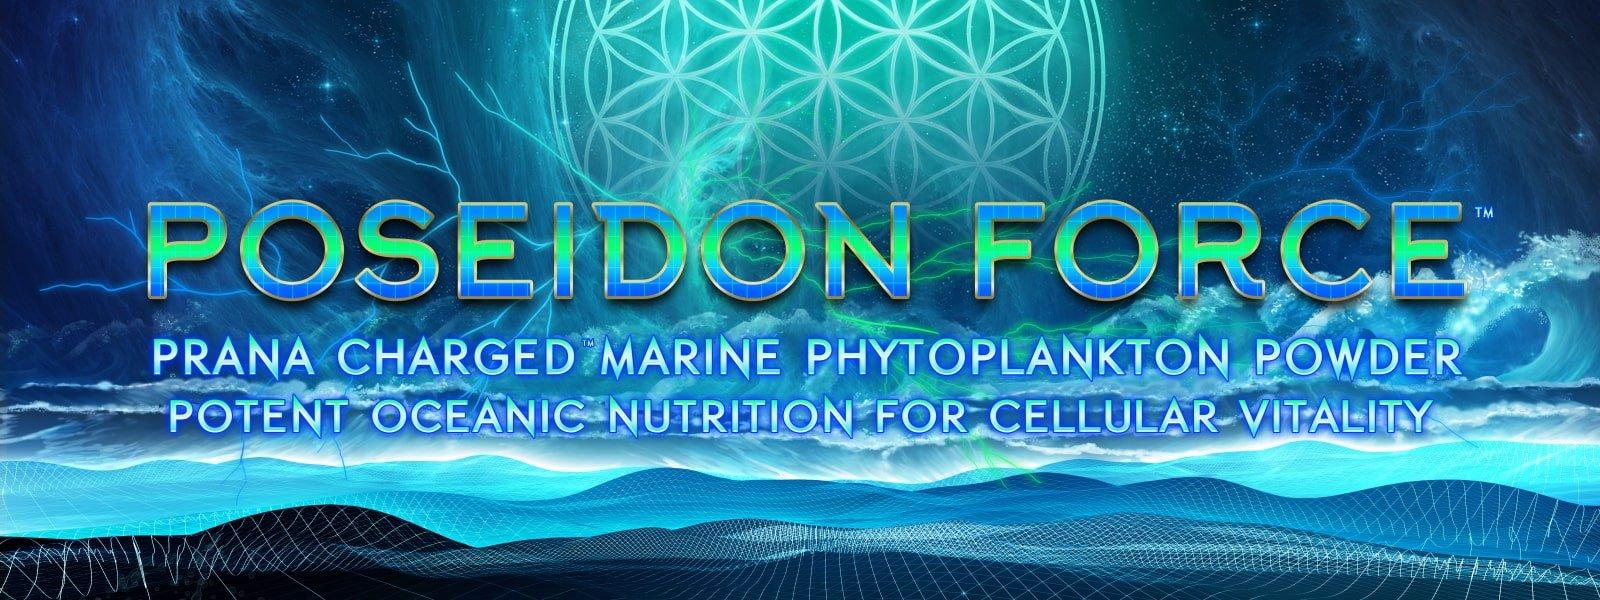 poseidon force marine phytoplankton powder flower of life